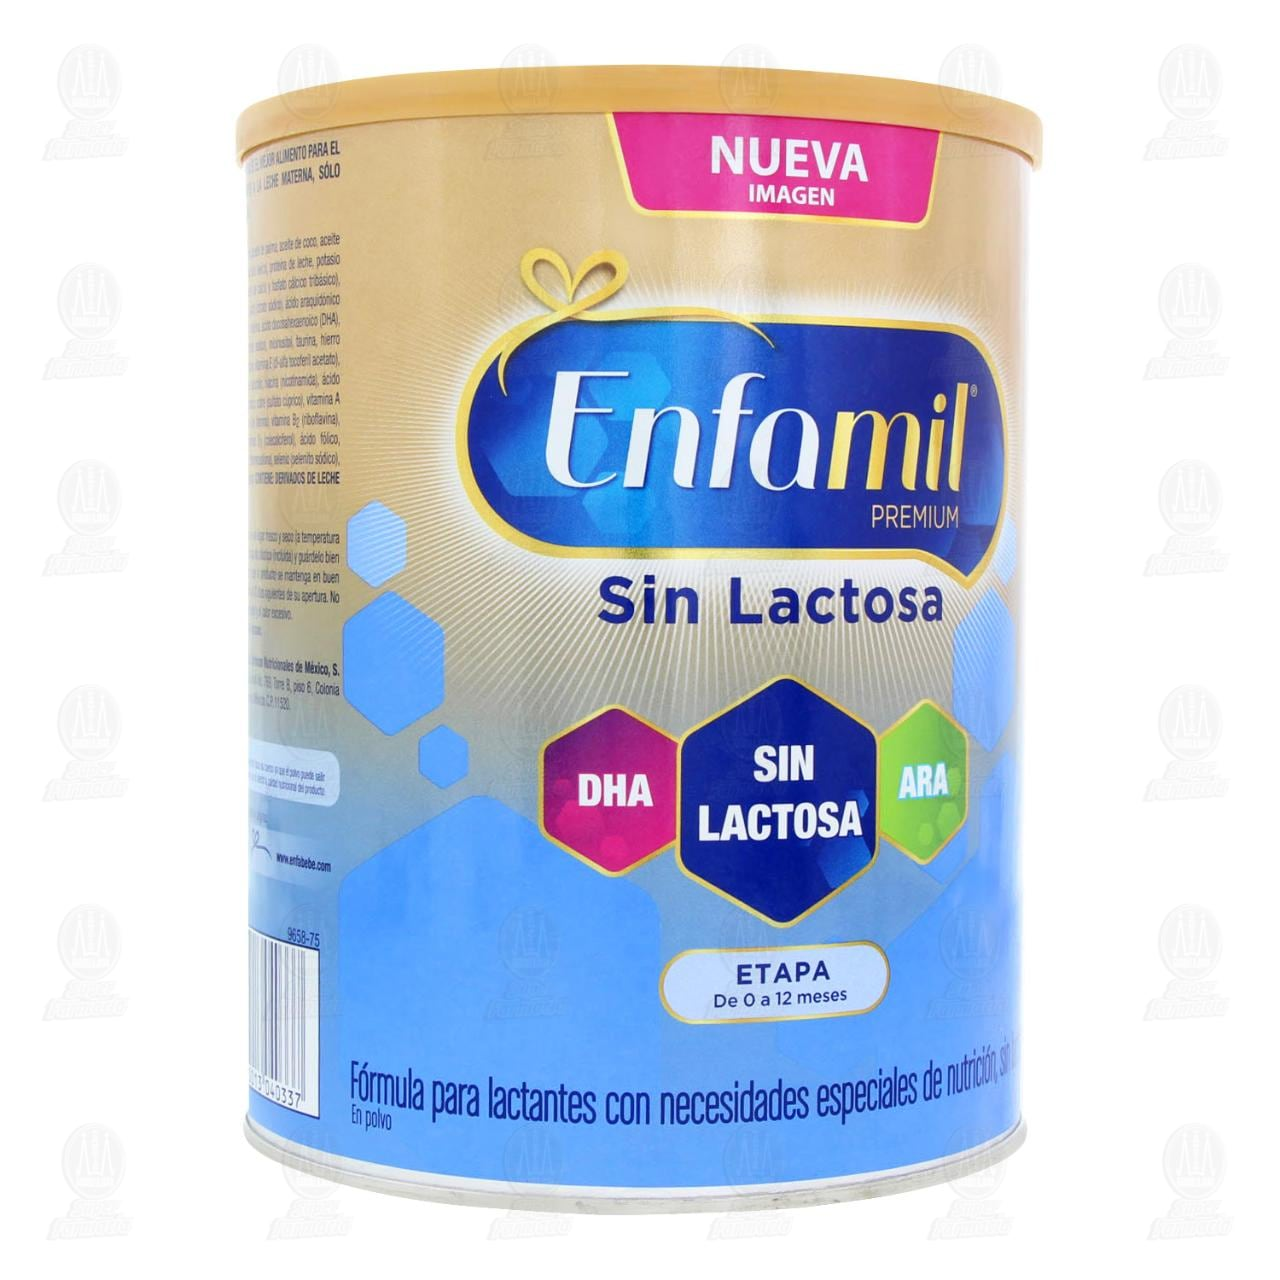 Comprar Fórmula Infantil Especializada Enfamil Premium Sin Lactosa, Edad 0-12 Meses, 900 gr. en Farmacias Guadalajara